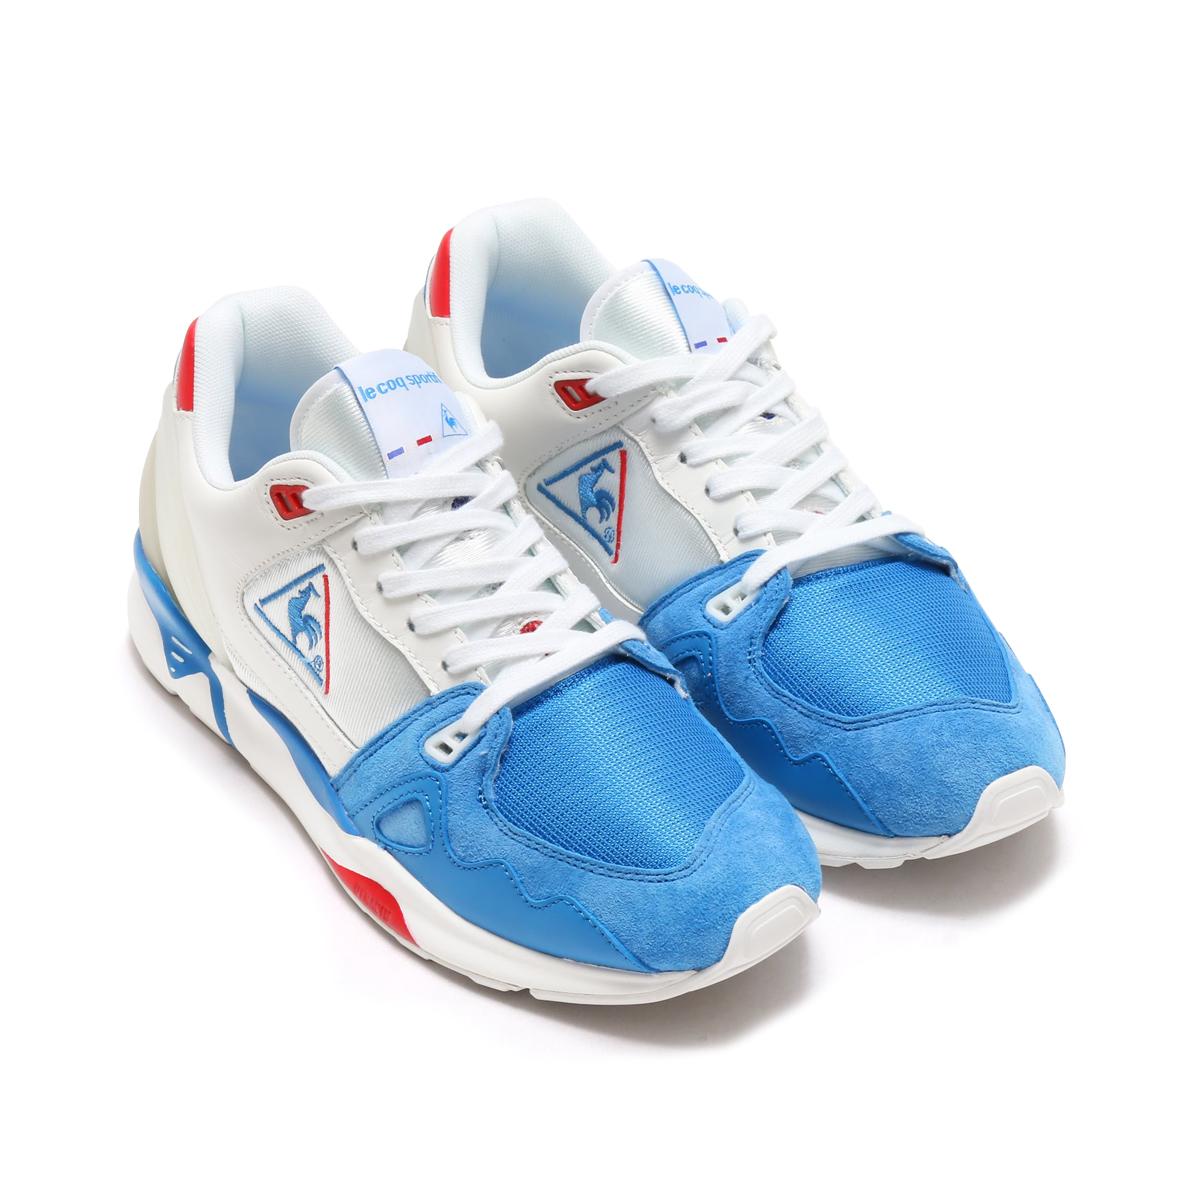 22e136b193b denmark le coq sportif lcs r921 le coq sportif lcs r921 white blue red 18ss  i